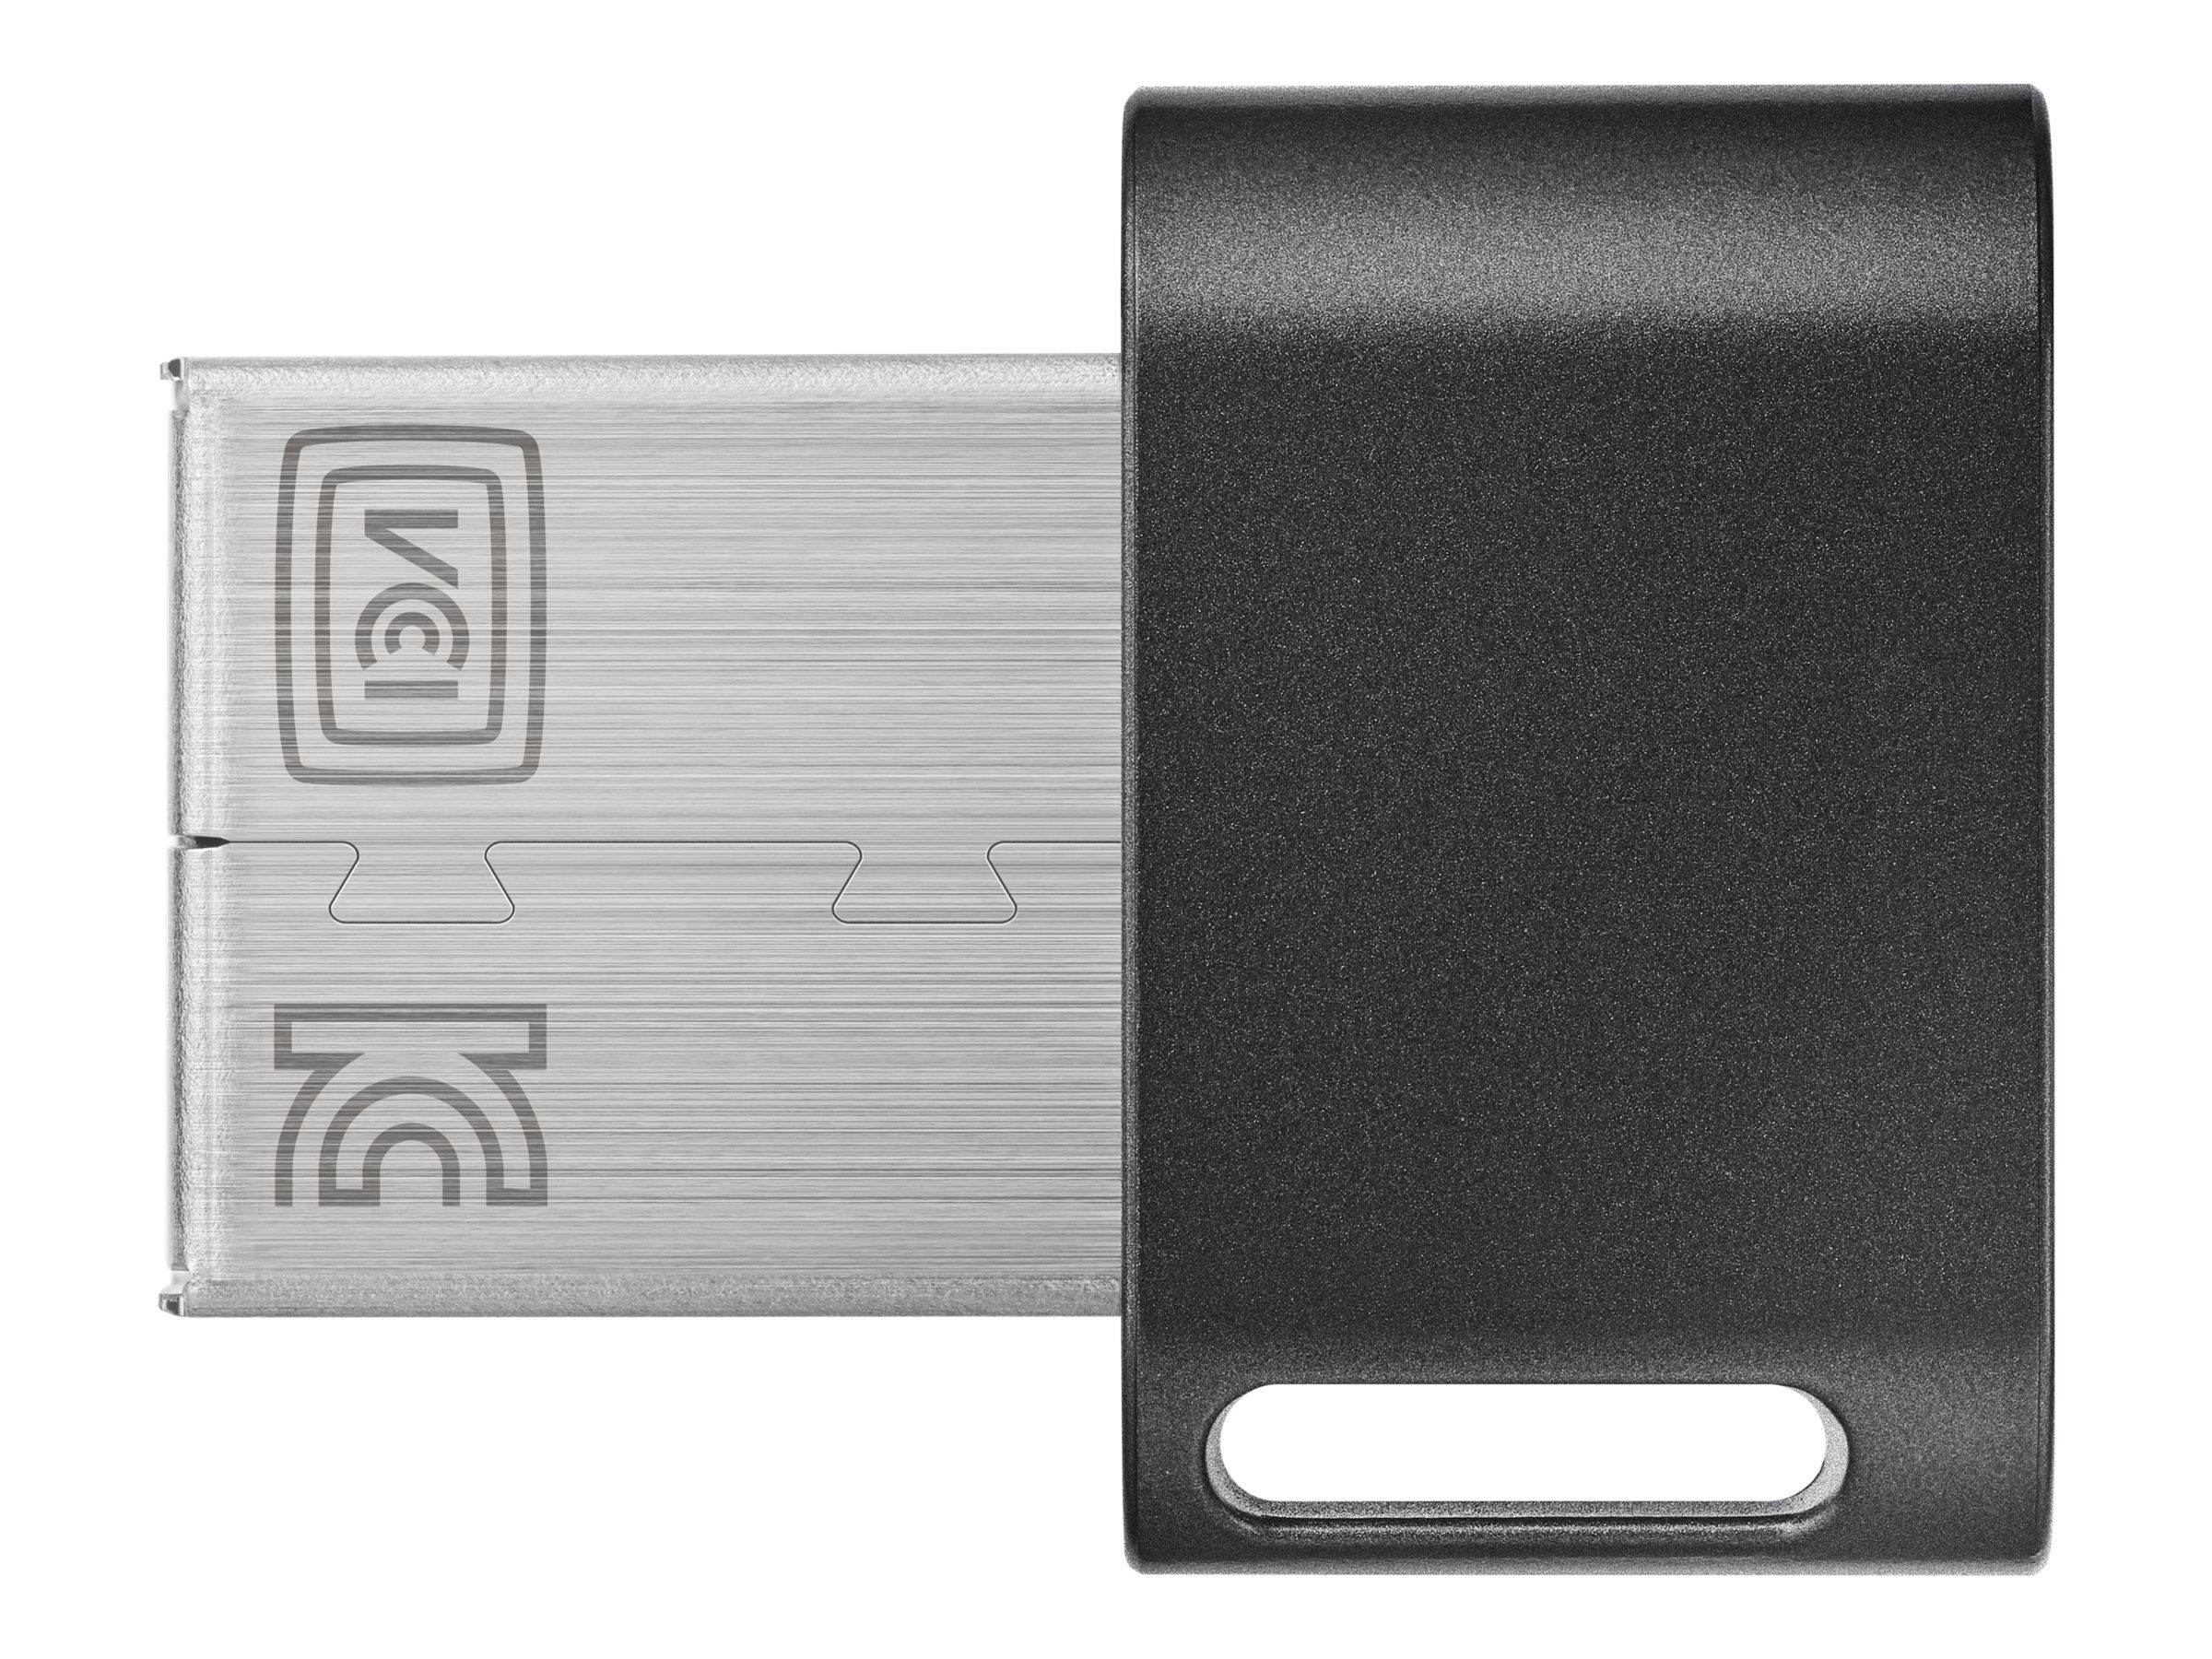 Samsung FIT Plus MUF-64AB - USB-Flash-Laufwerk